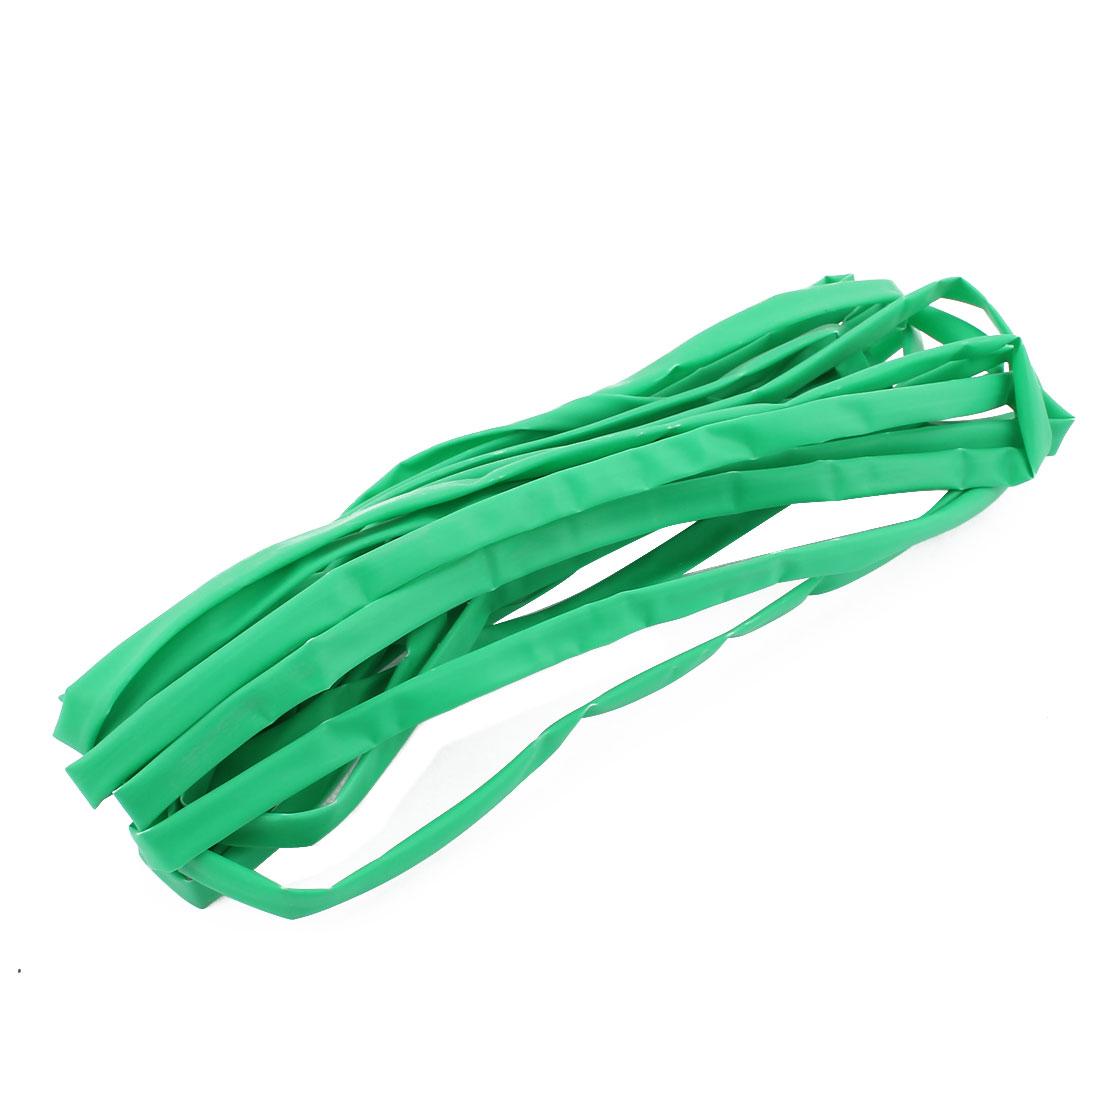 6M Length 6mm Dia Polyolefin Heat Shrinkable Tube Sleeving Green